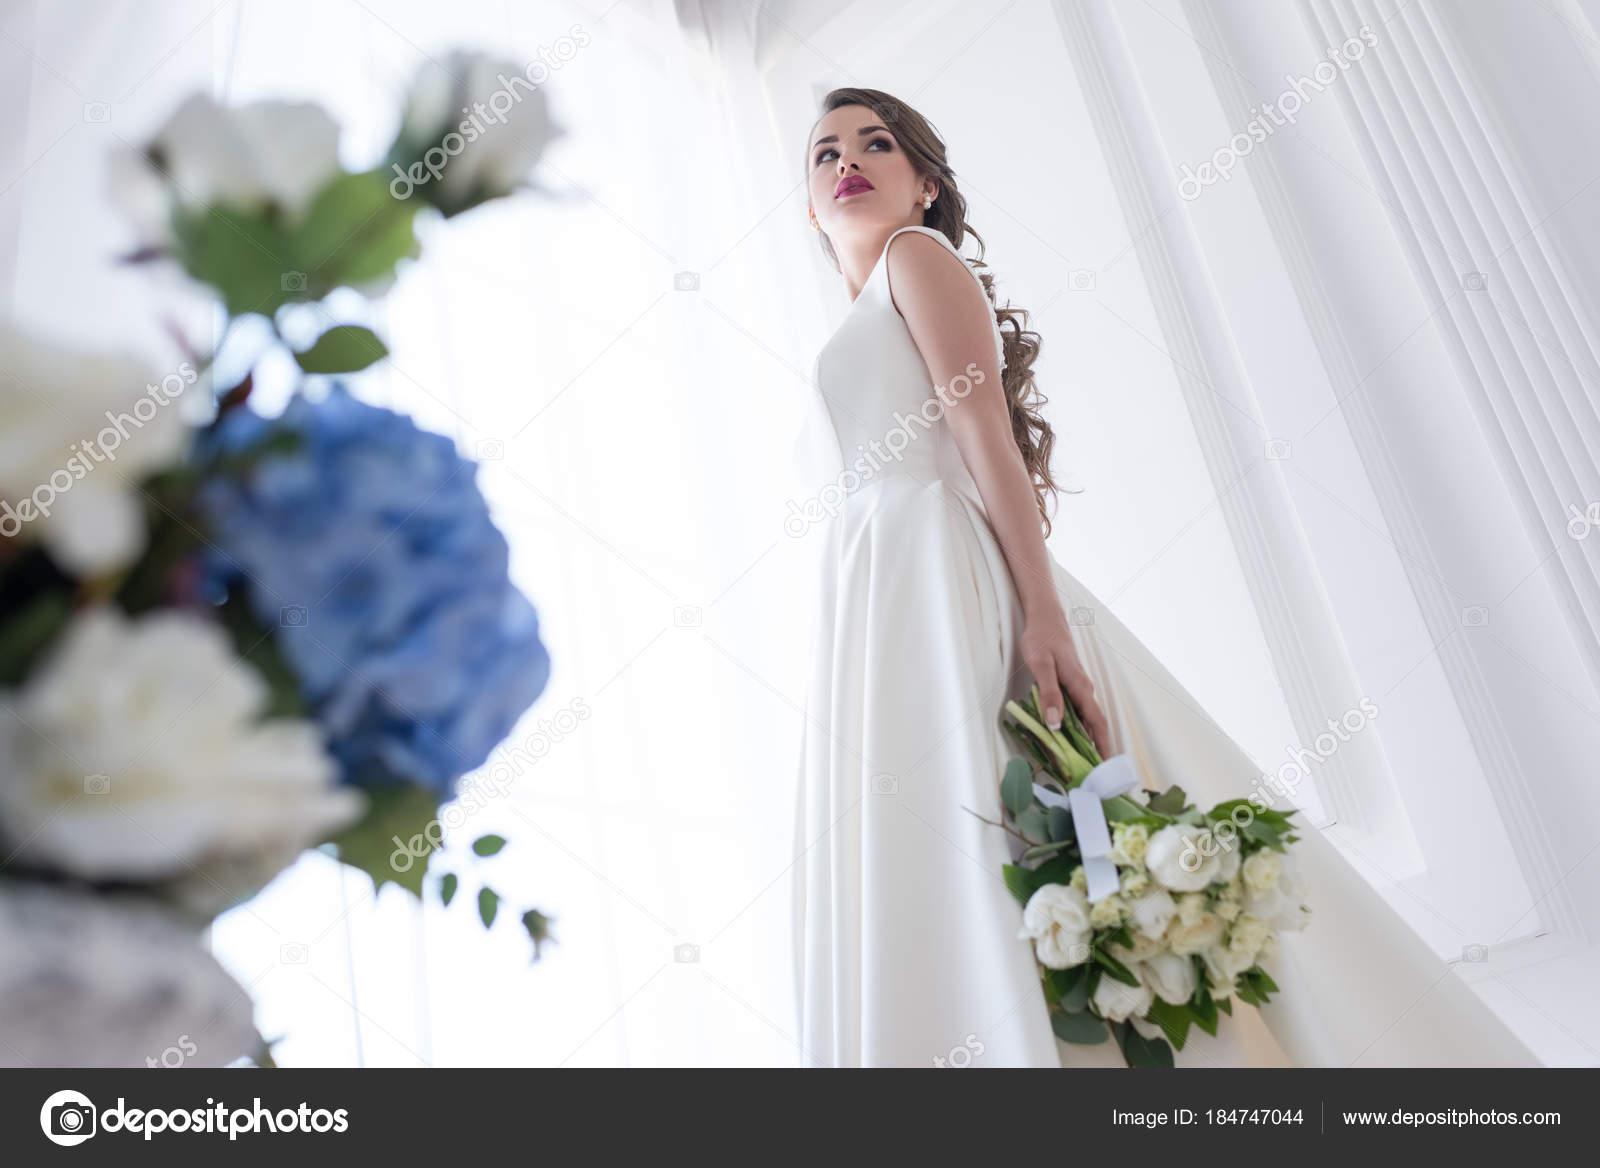 Bottom View Bride Posing White Dress Wedding Bouquet Stock Photo